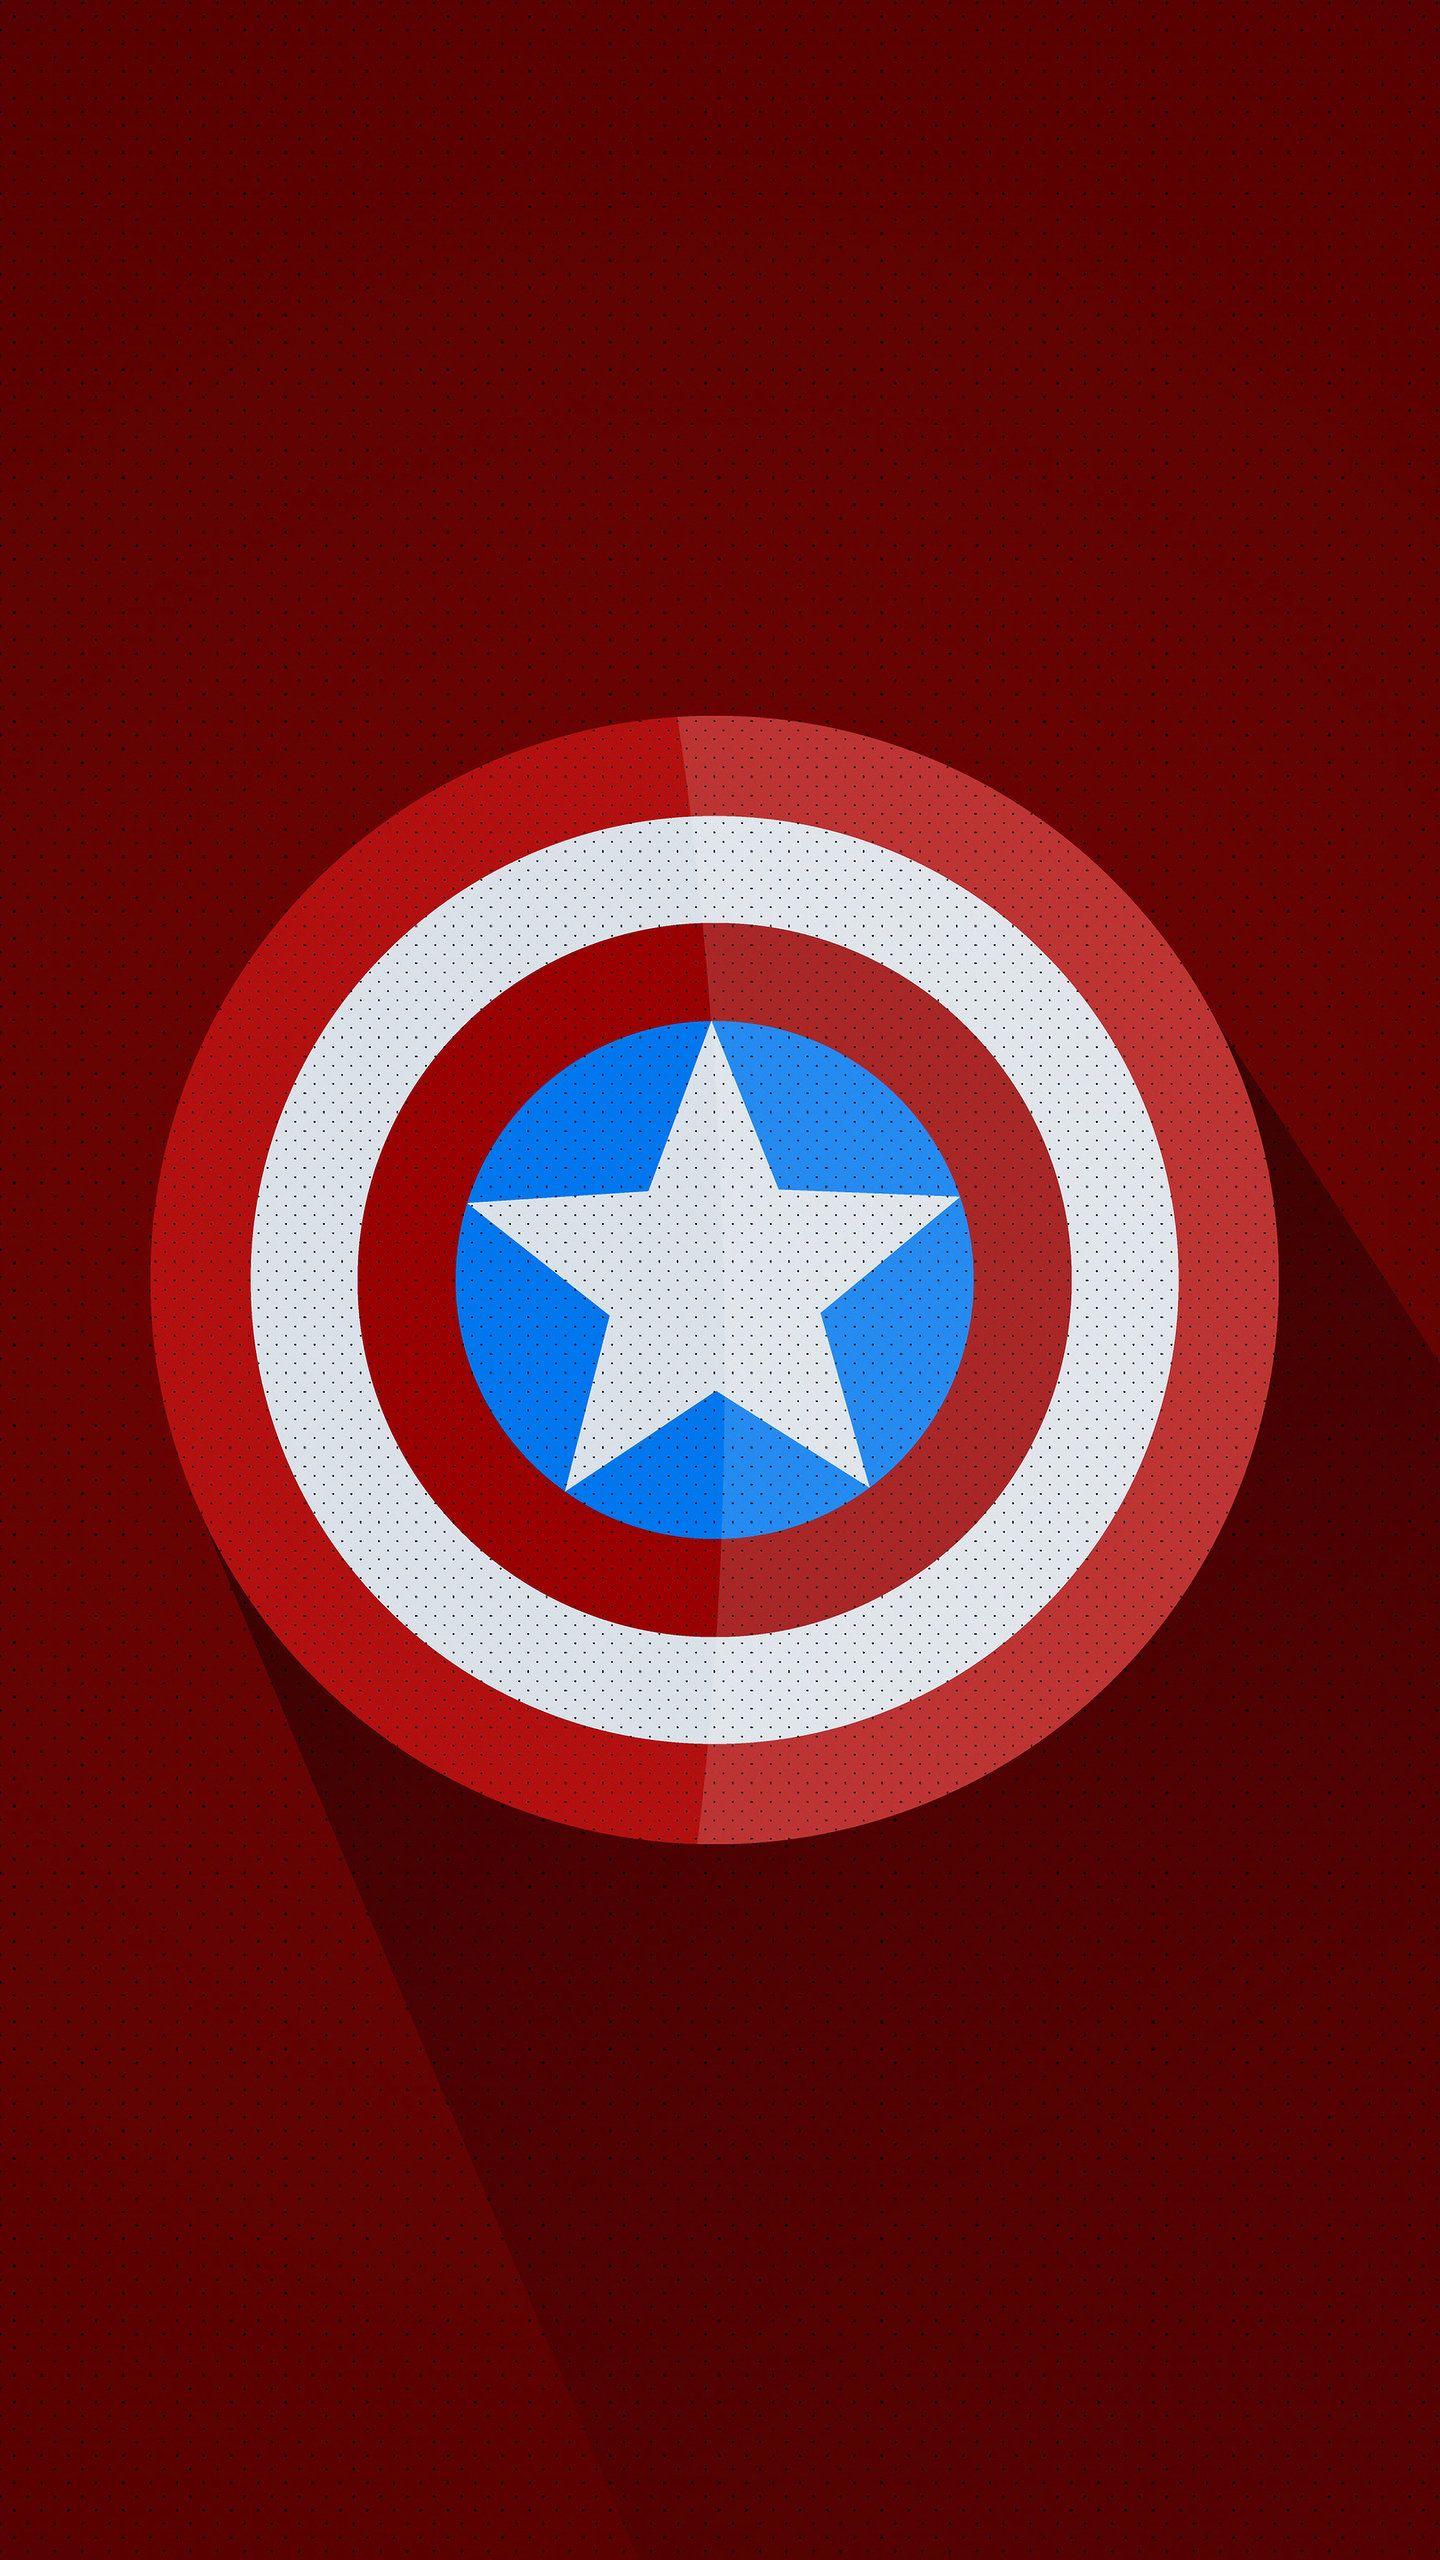 Captain America Minimal Logo 5k Hd Wallpaper In 2020 Captain